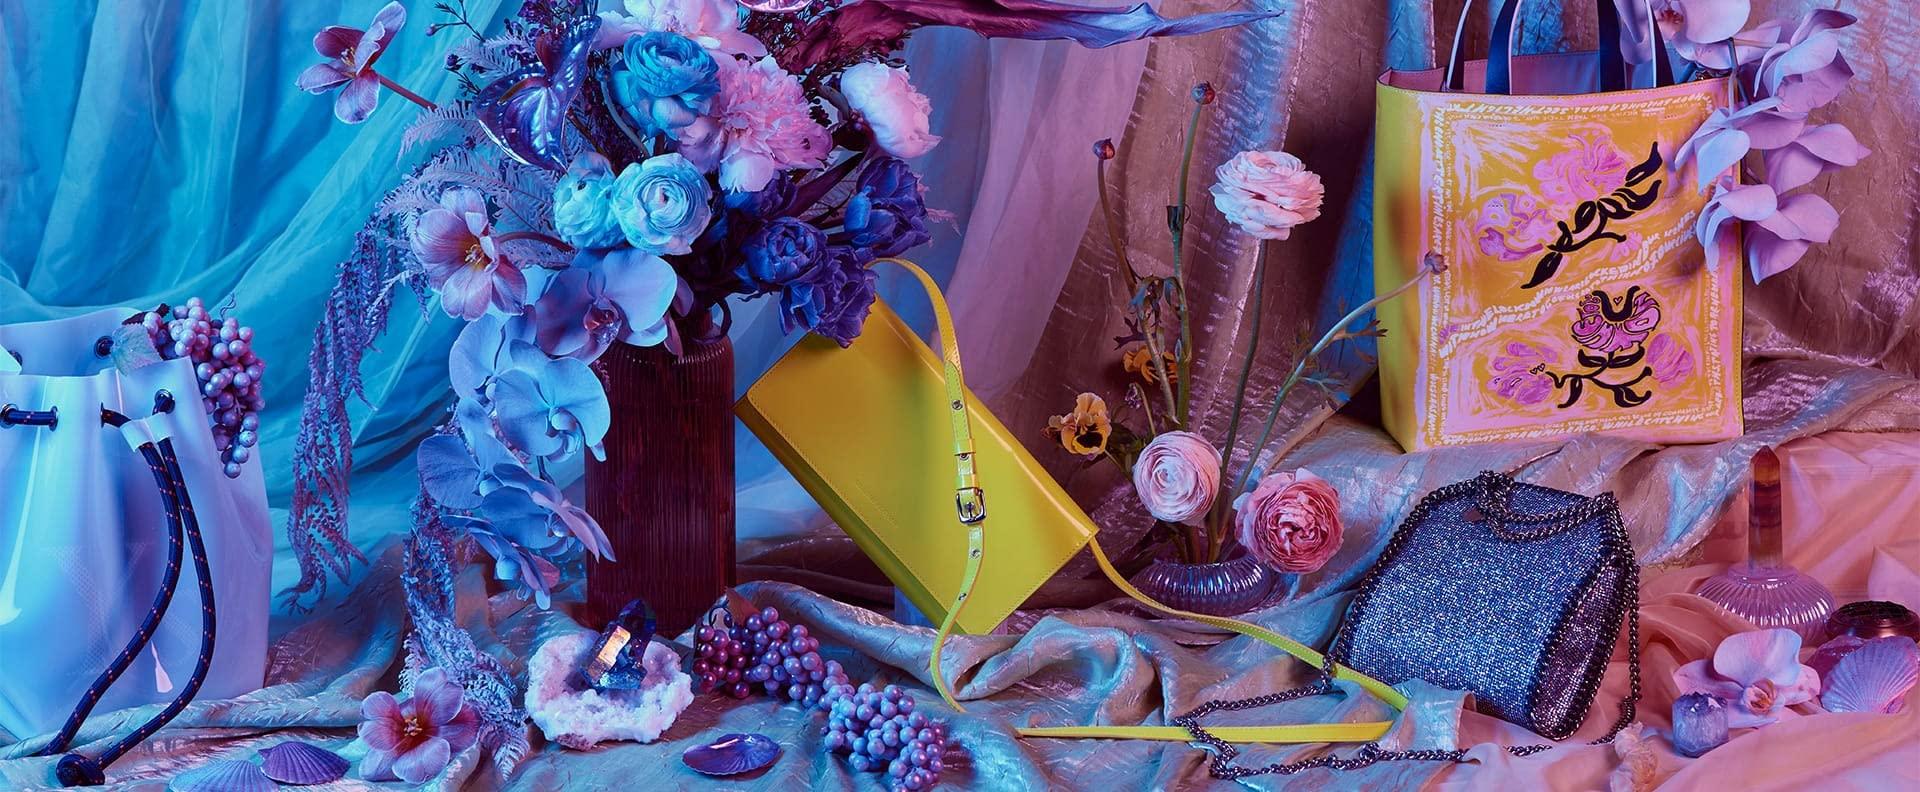 VRSNL Handbags